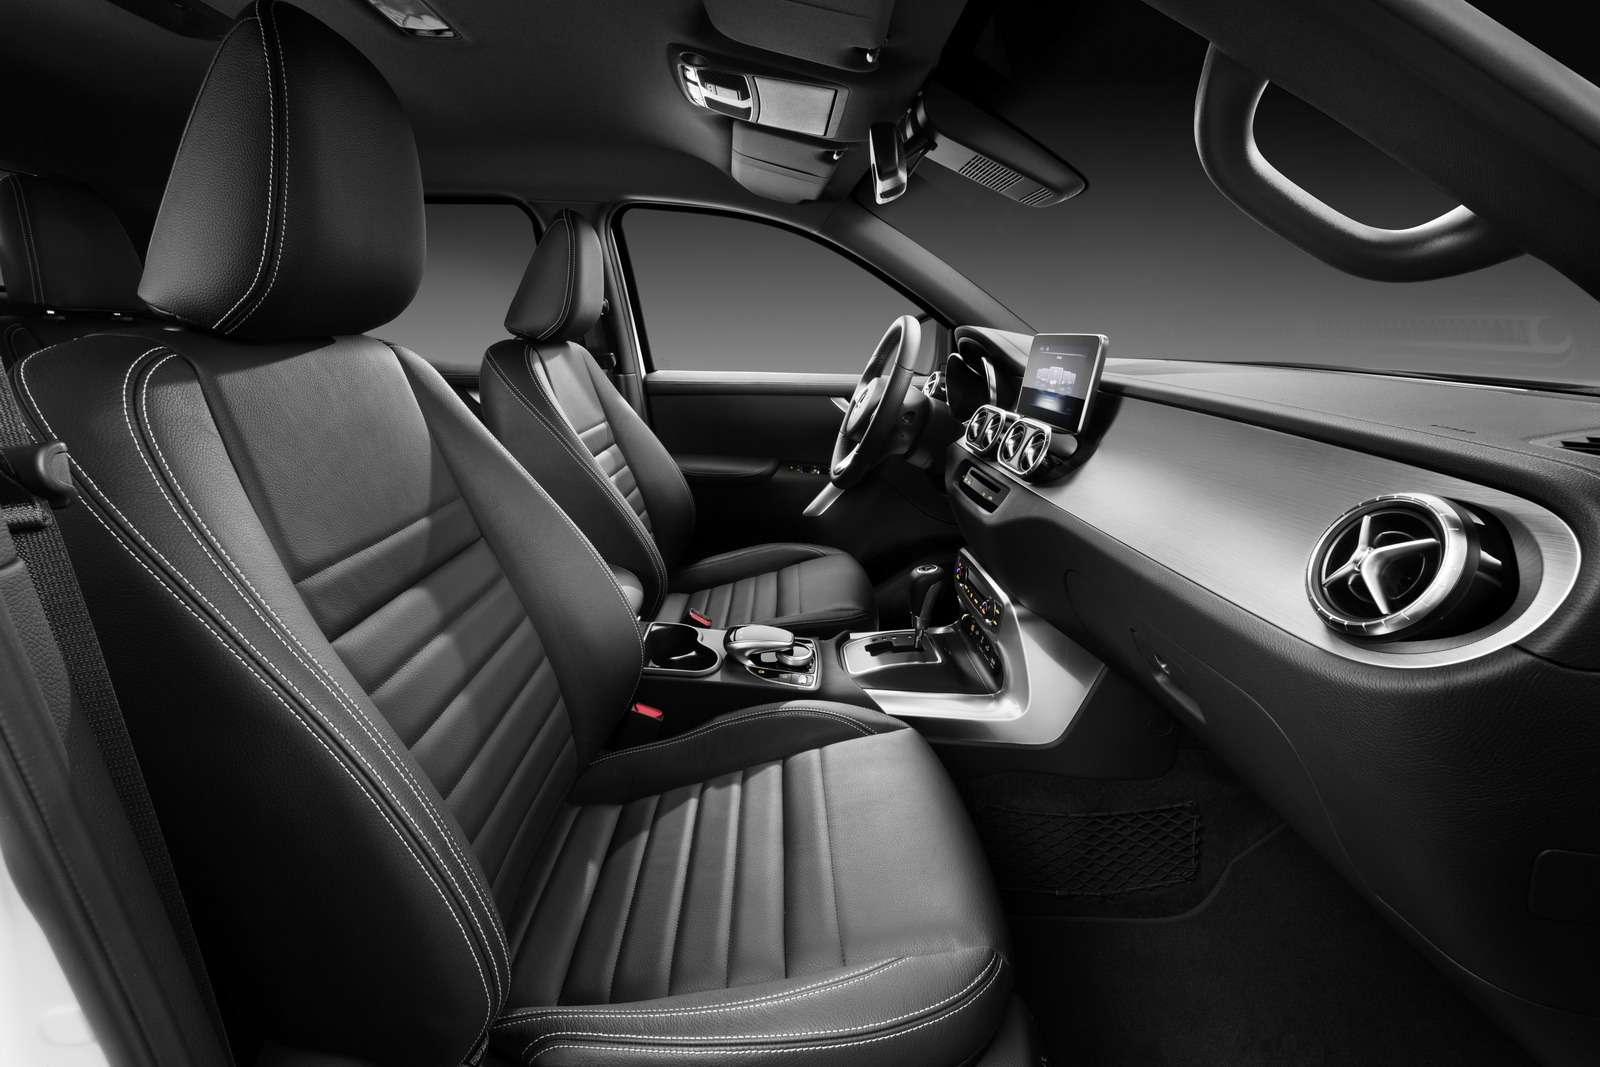 Mercedes-Benz X-класса: пружины вместо рессор— фото 776021